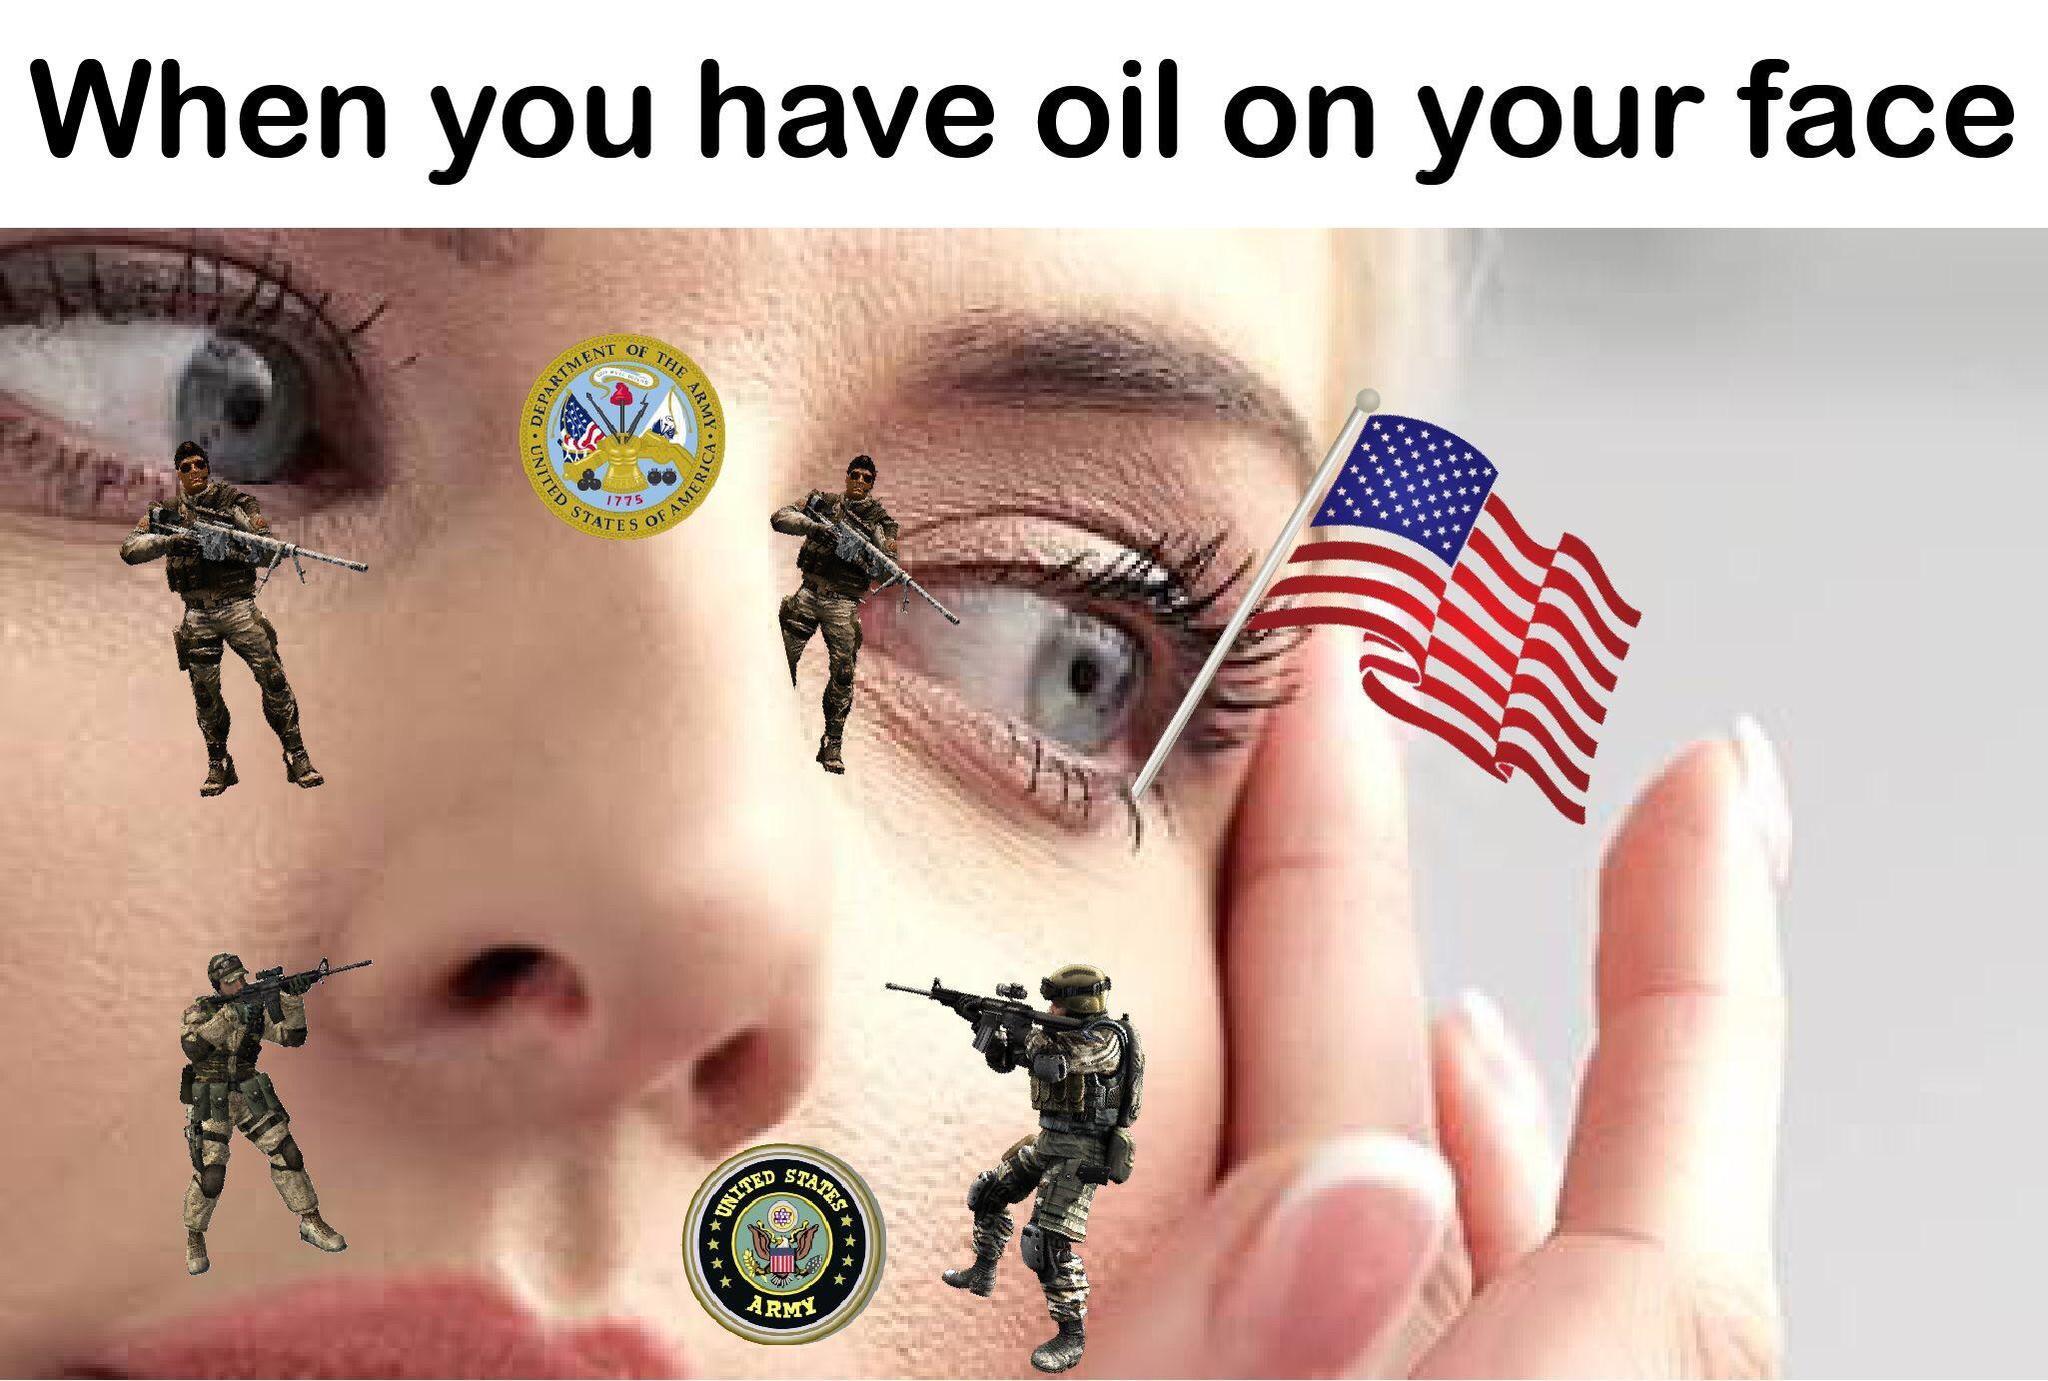 funny oil meme